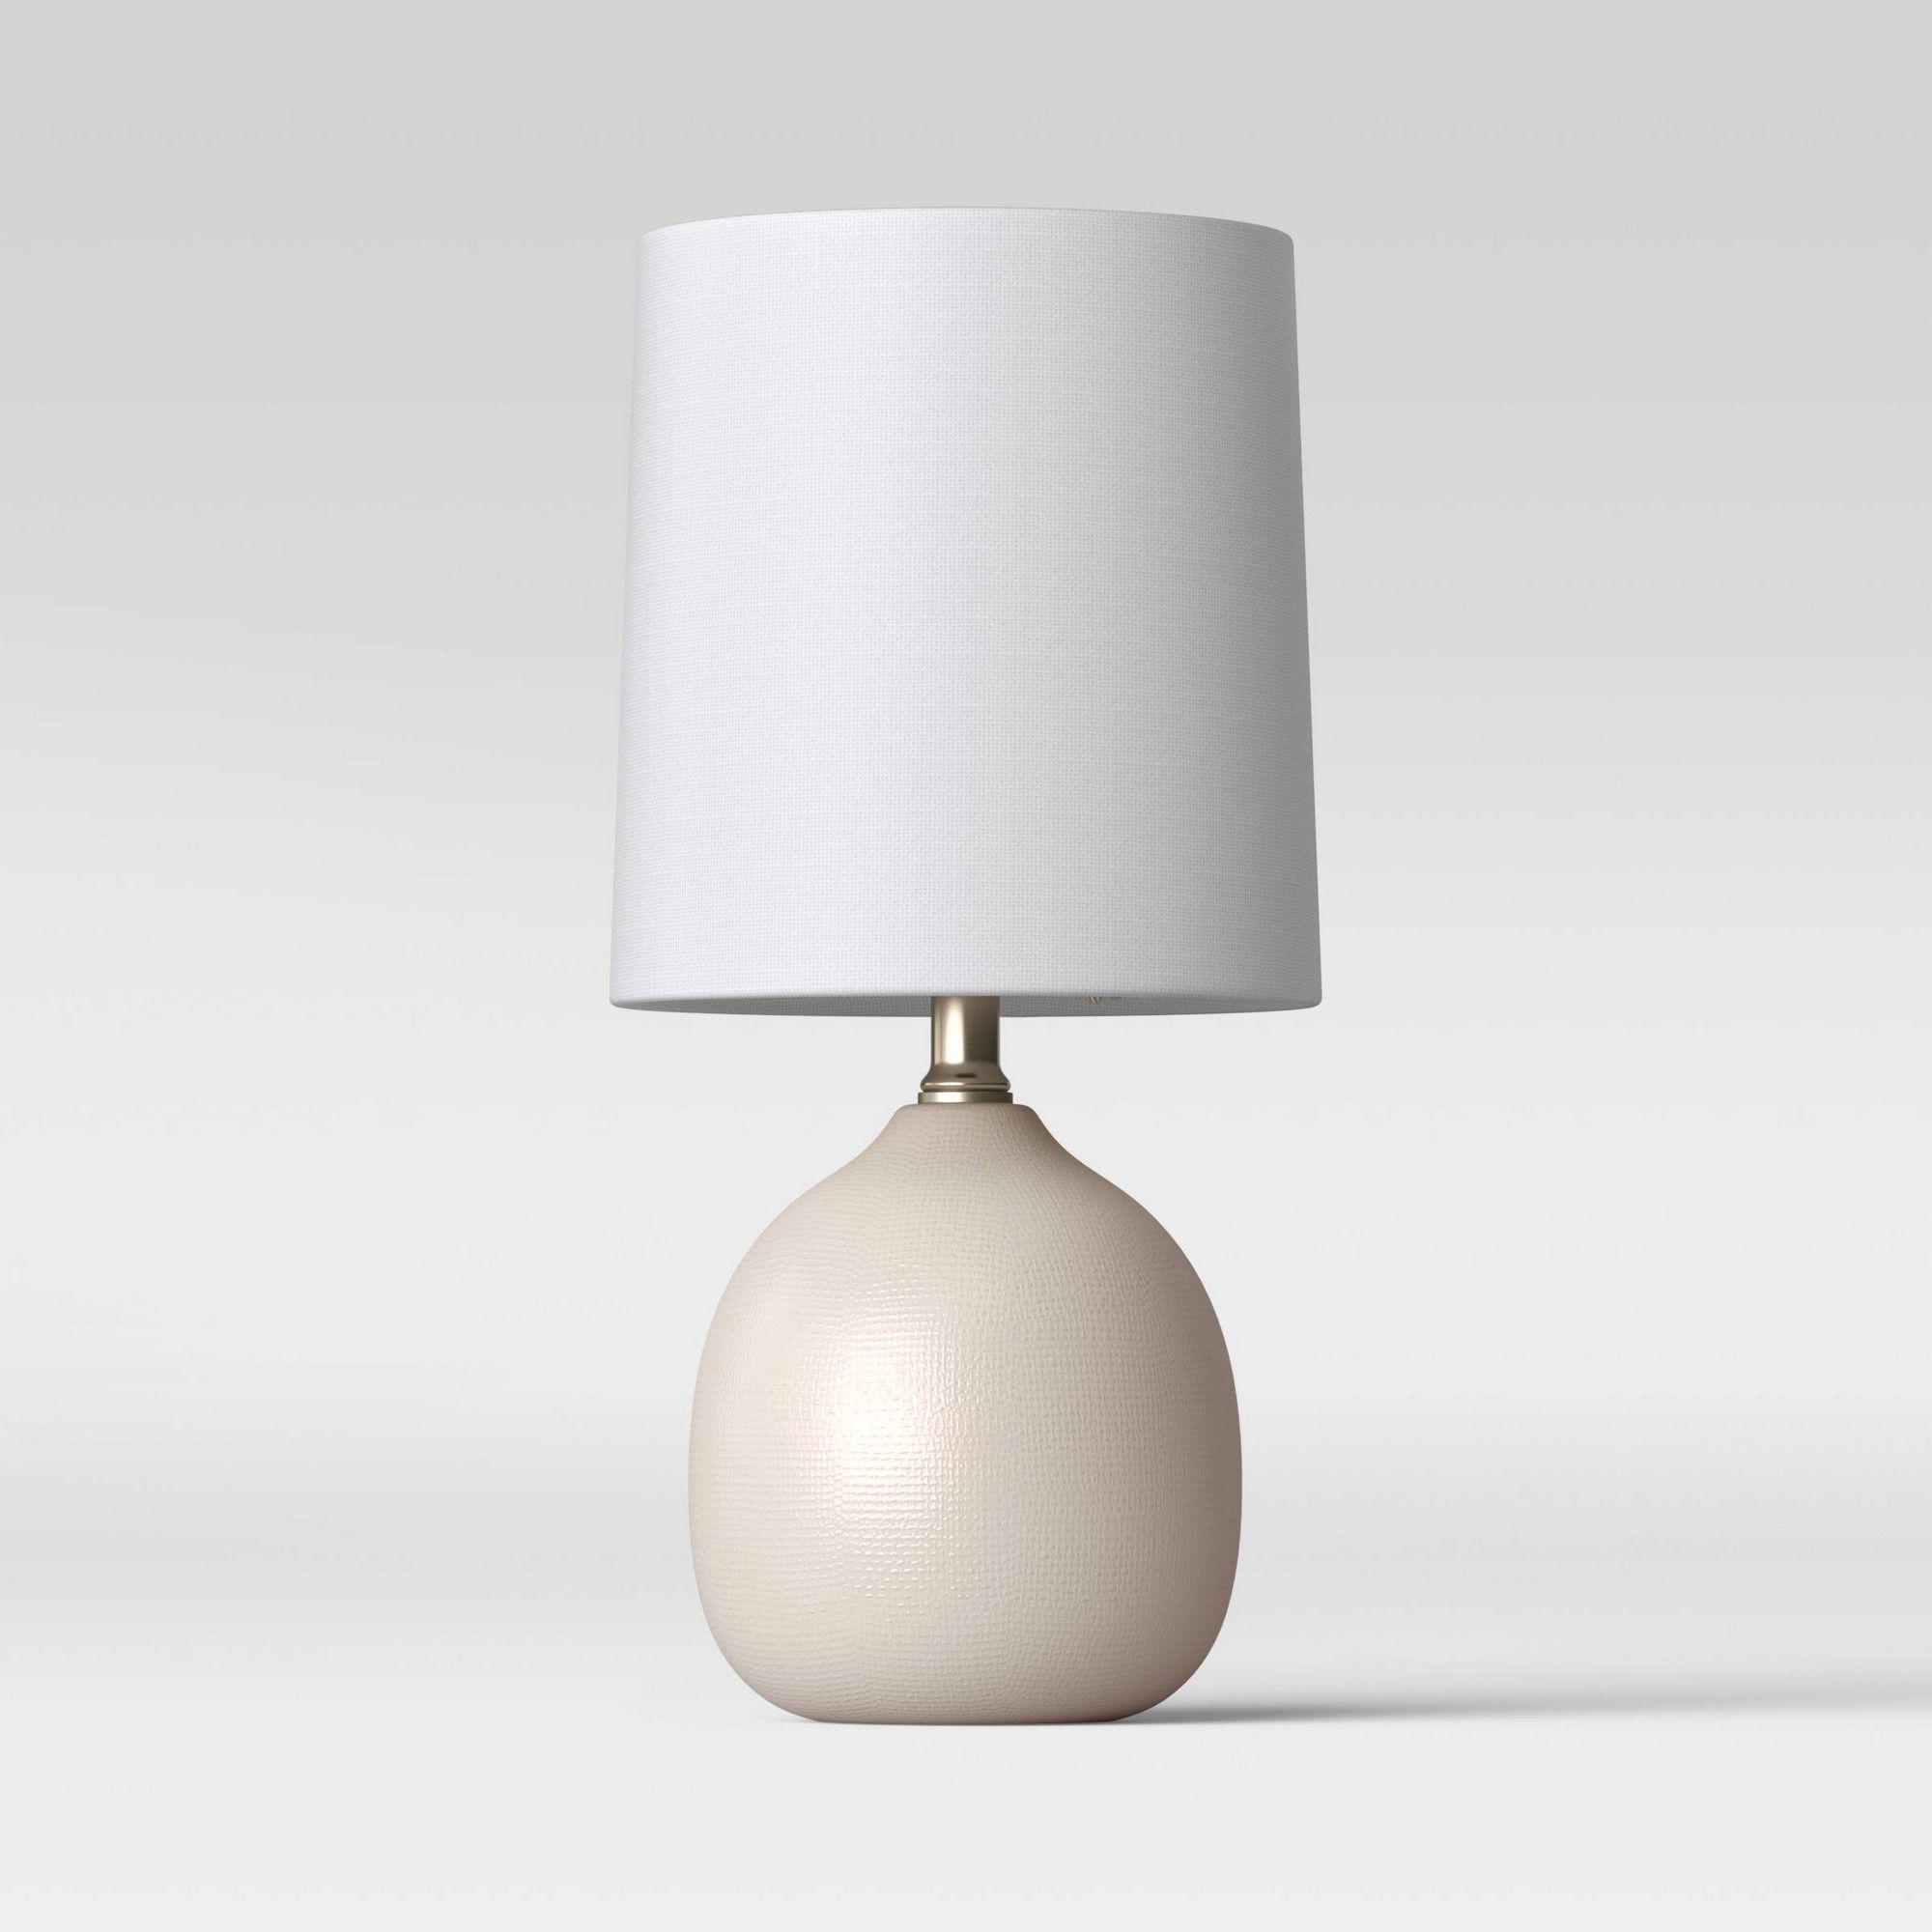 Threshold Ceramic Pattern Accent Lamp White Lamp Only Task